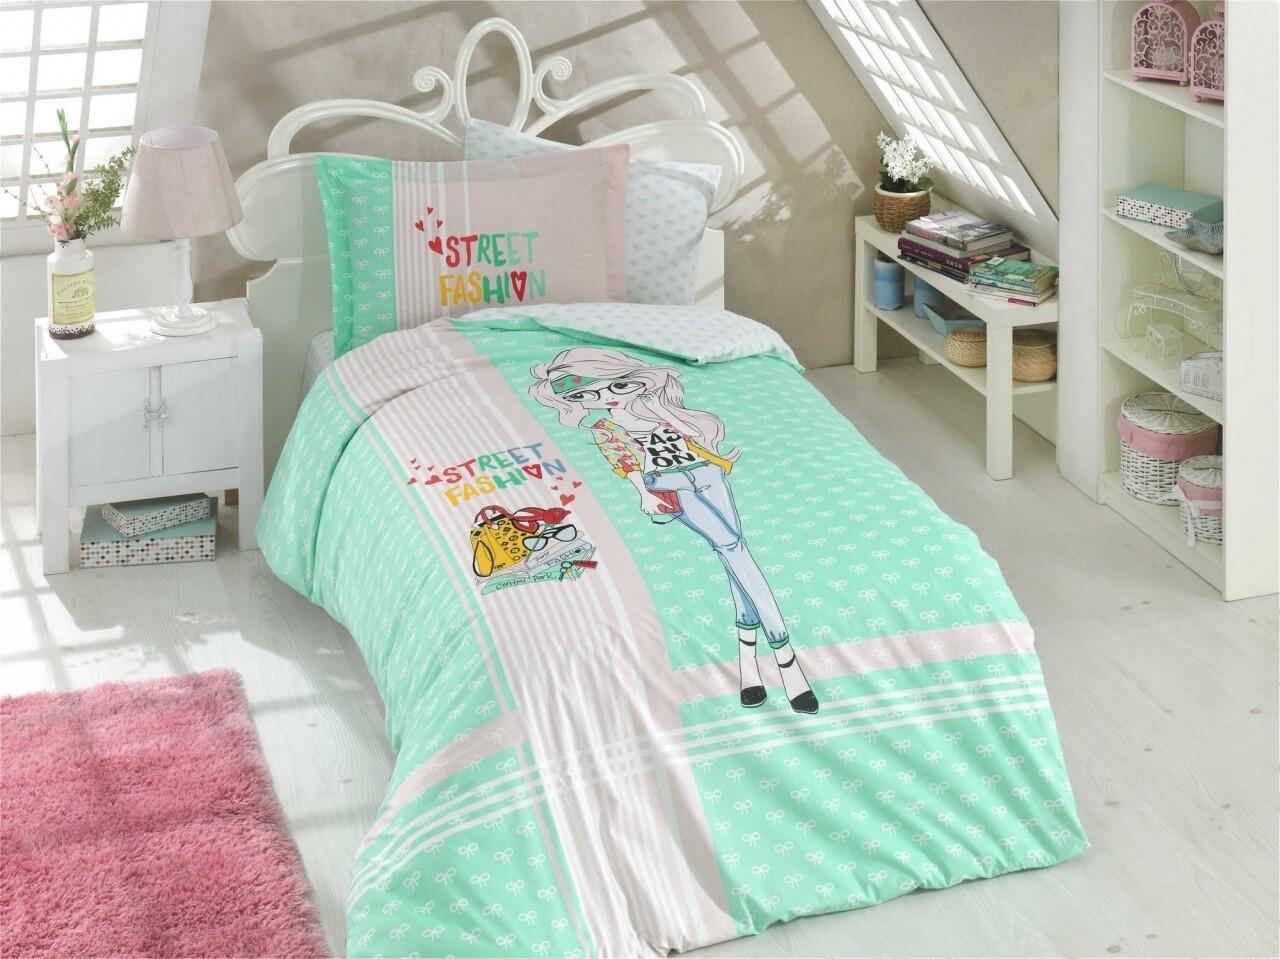 Lenjerie de pat pentru o persoana, 3 piese, 100% bumbac poplin, Hobby, Street Fashion, verde